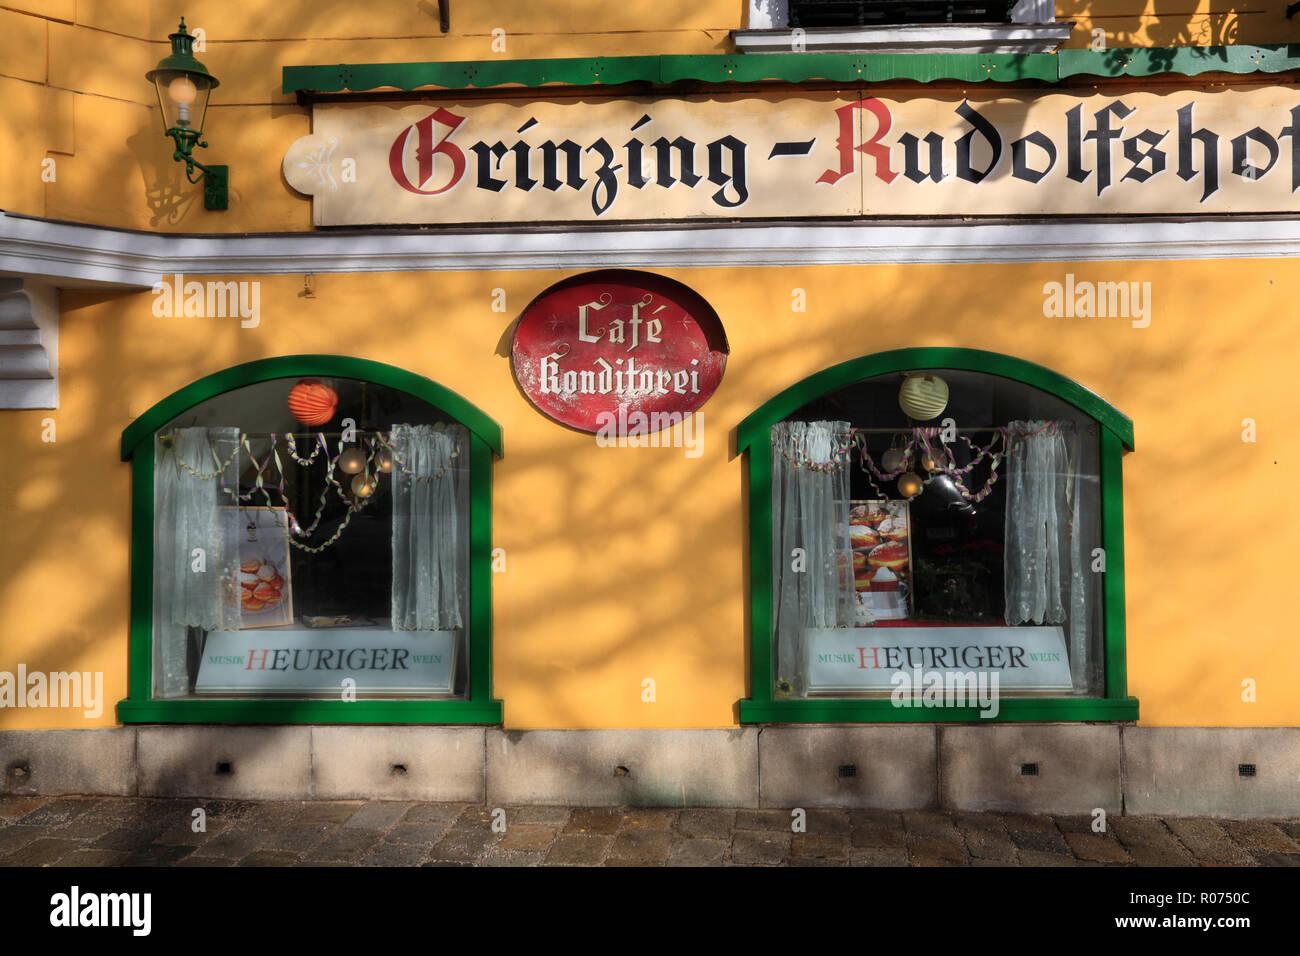 ÖSTERREICH, Wien, Grinzing, Heurigen-Lokal Rudolfshof - Stock Image